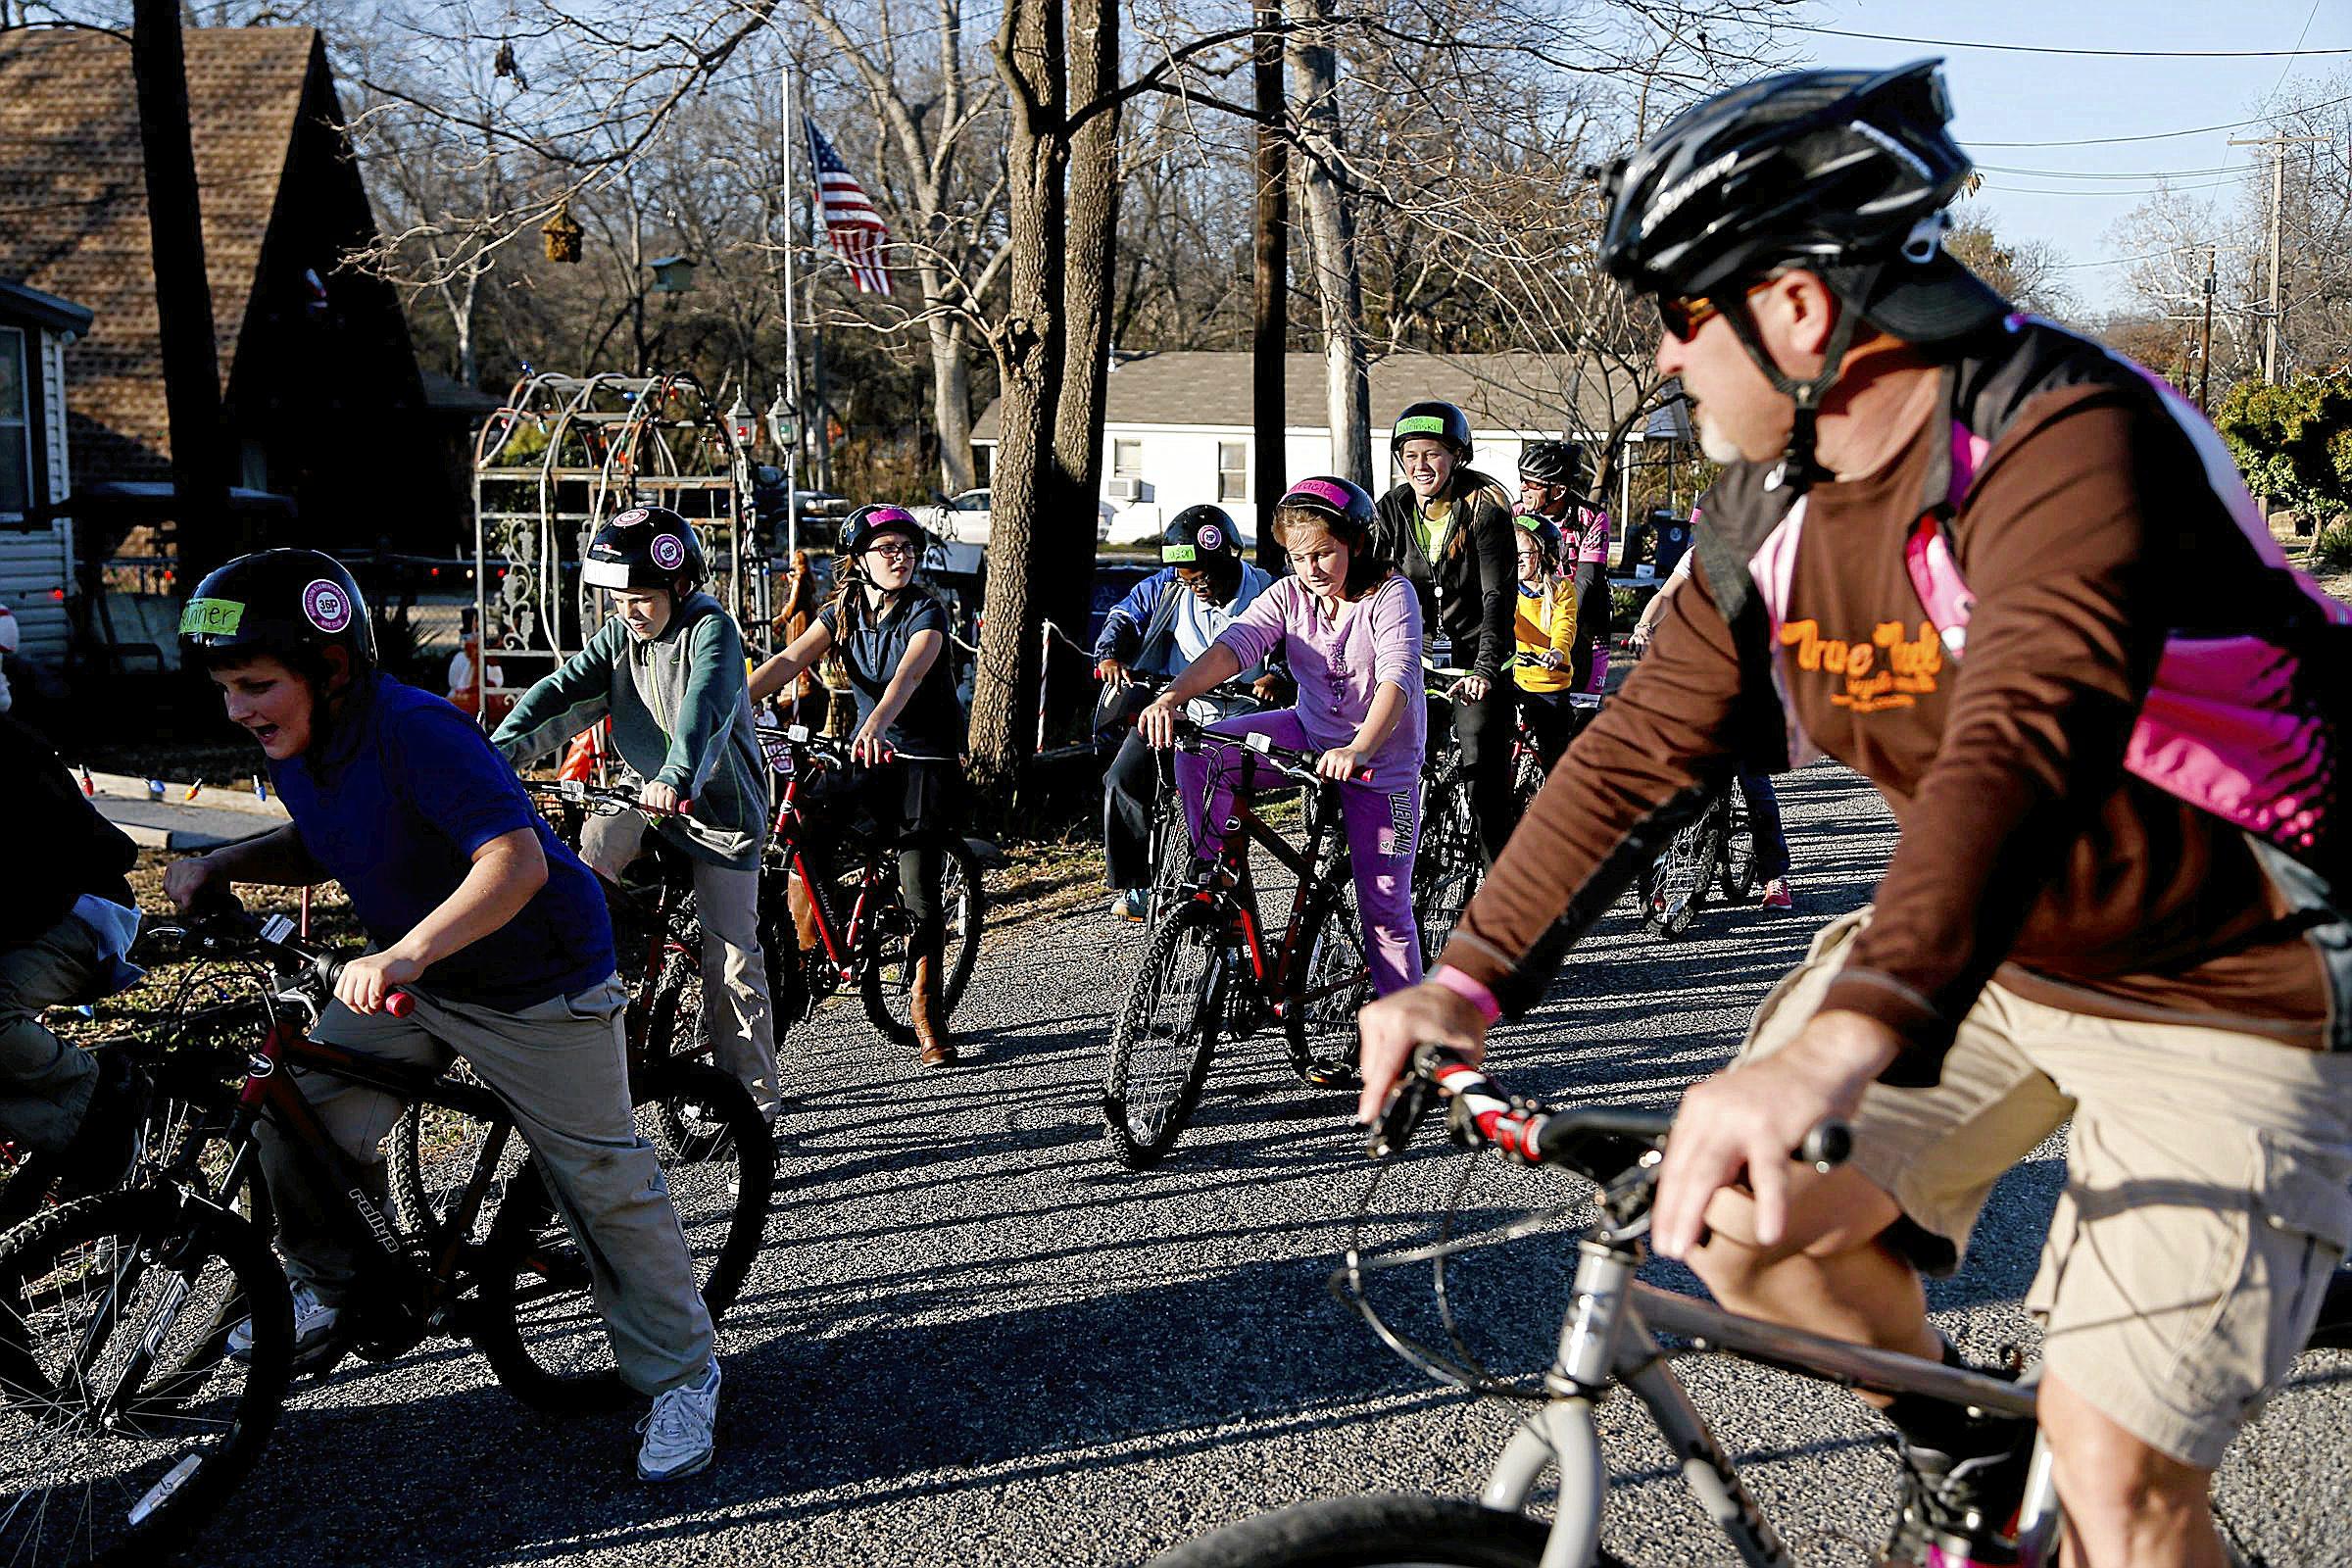 Photo gallery: After school bike clubs at Tulsa Public Schools